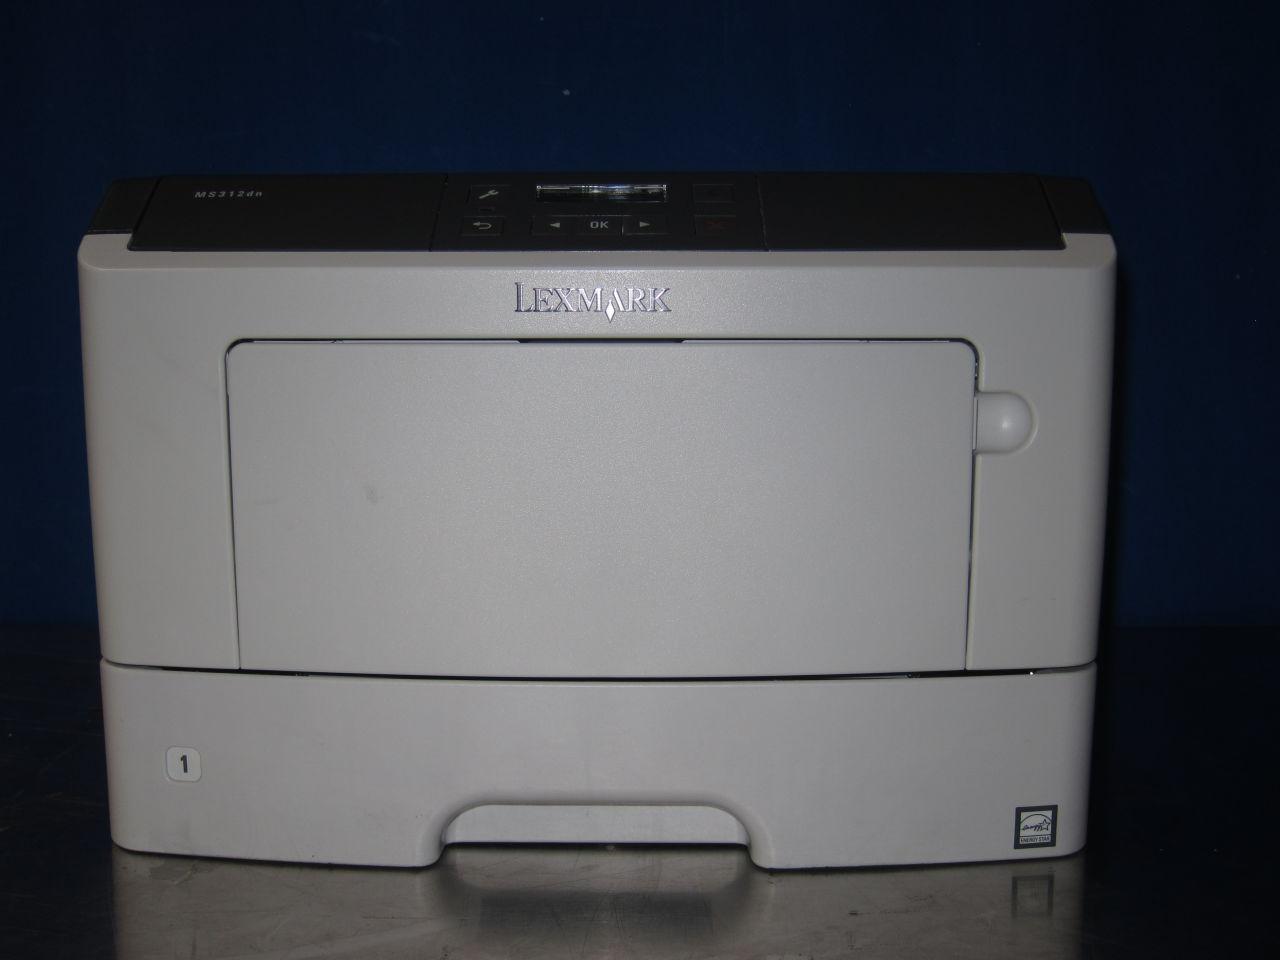 LEXMARK 4514-330 Laser Printer